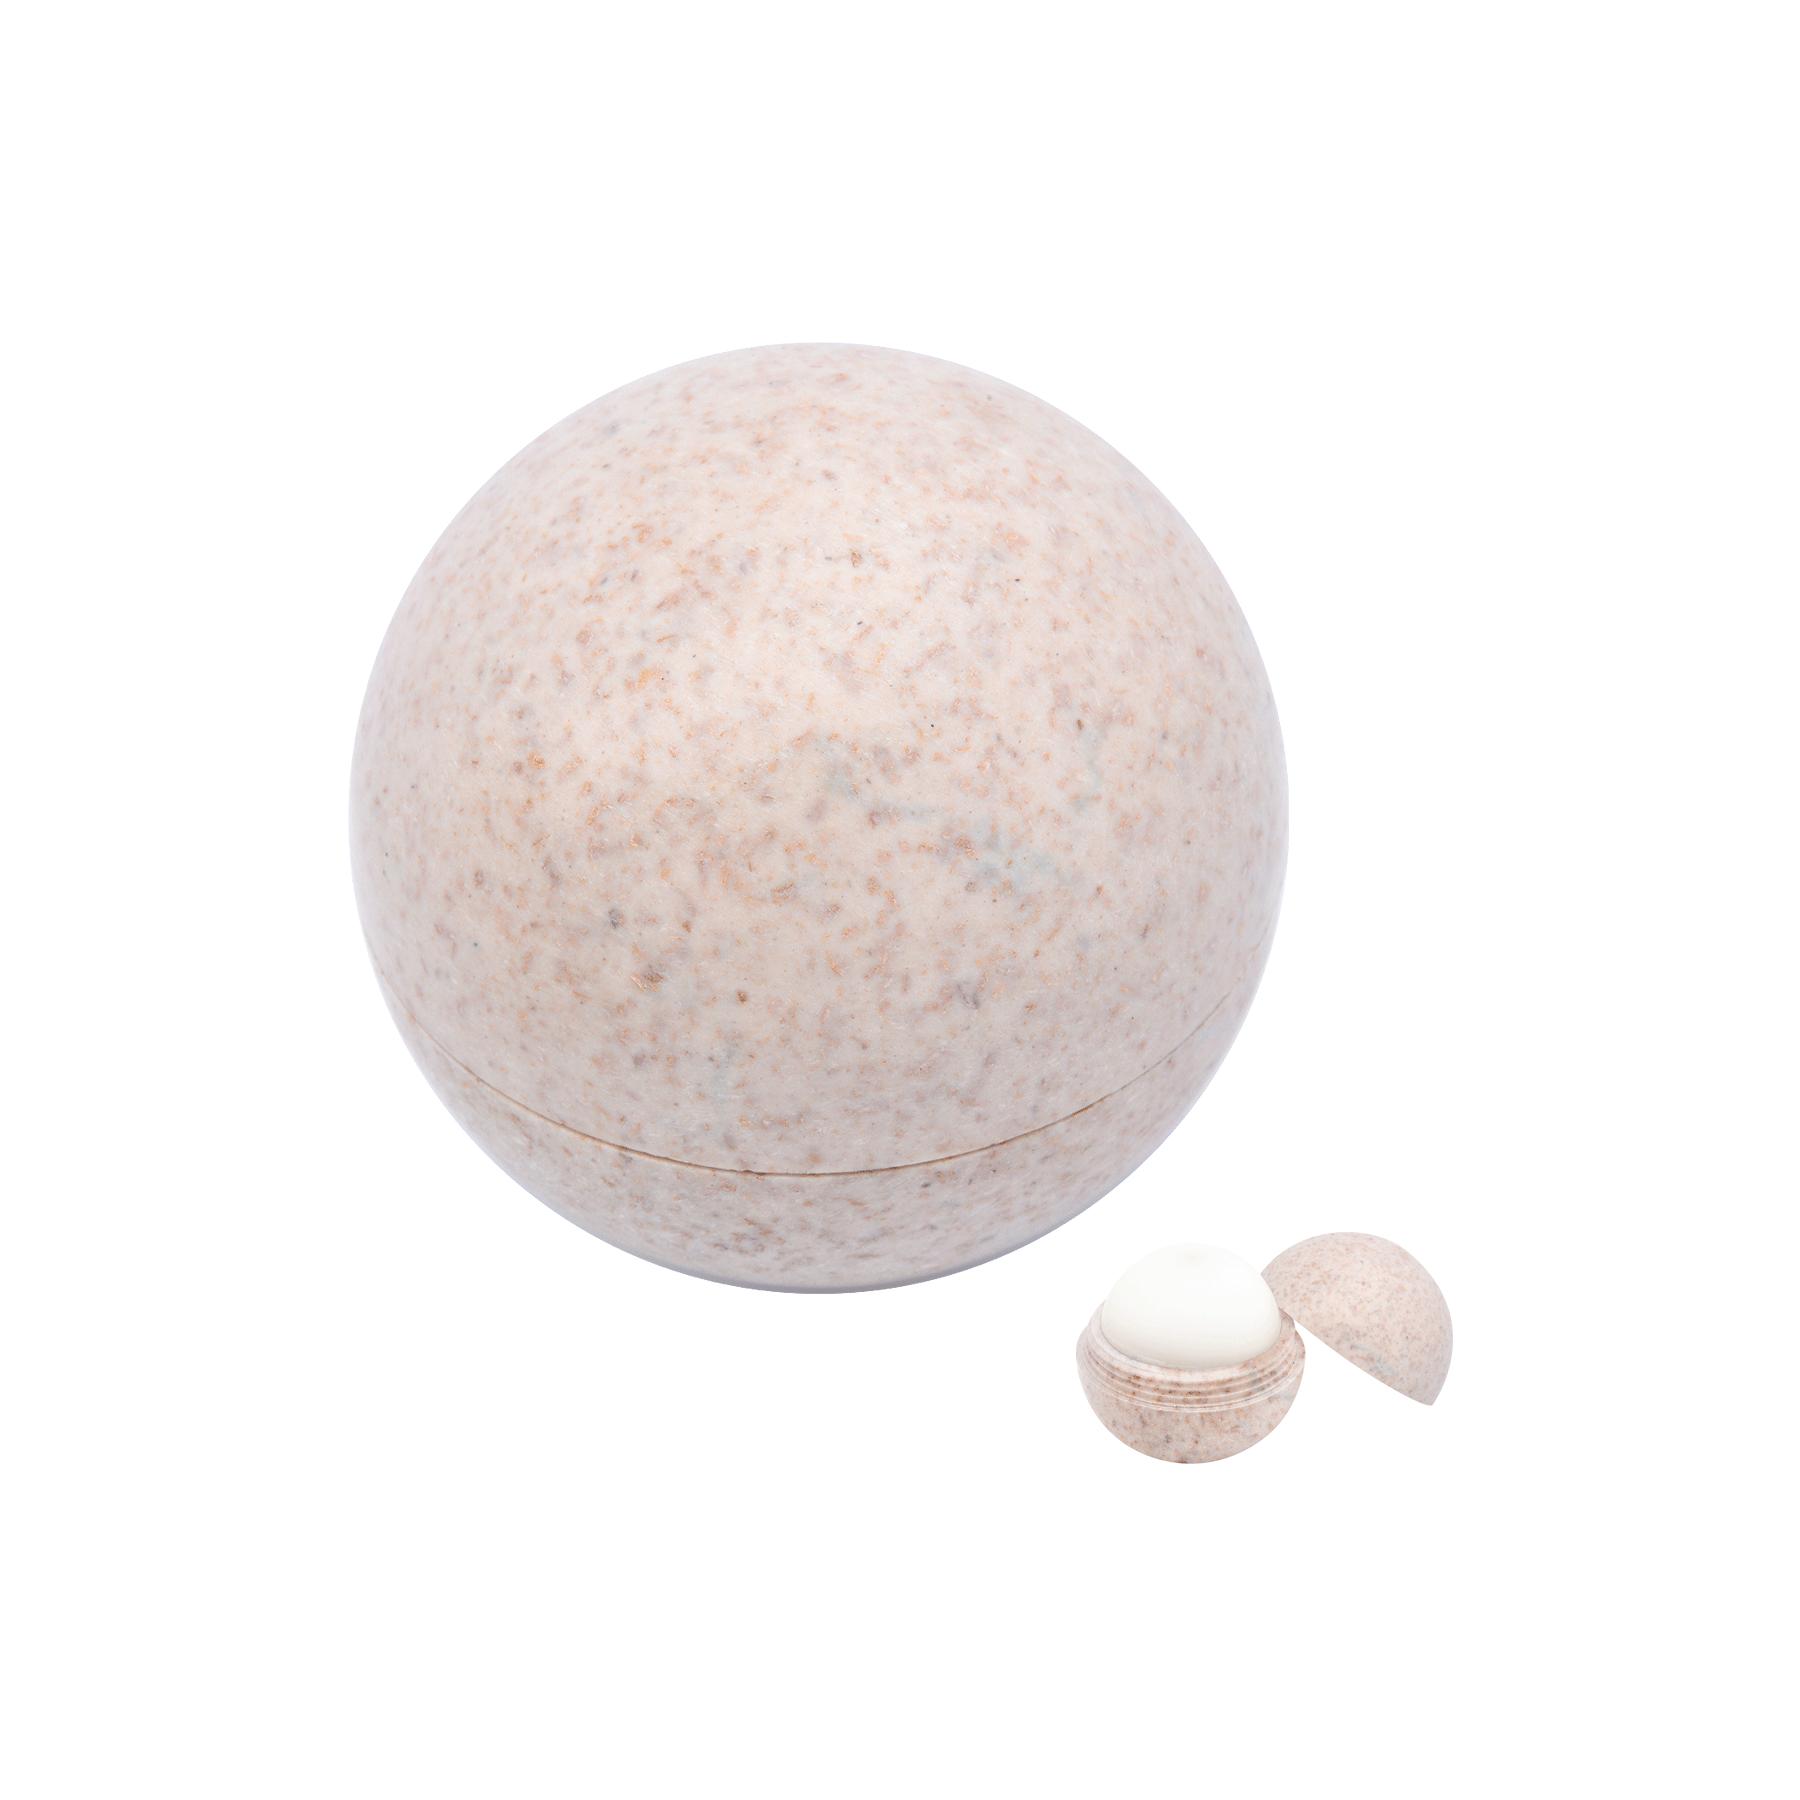 Wheat ball